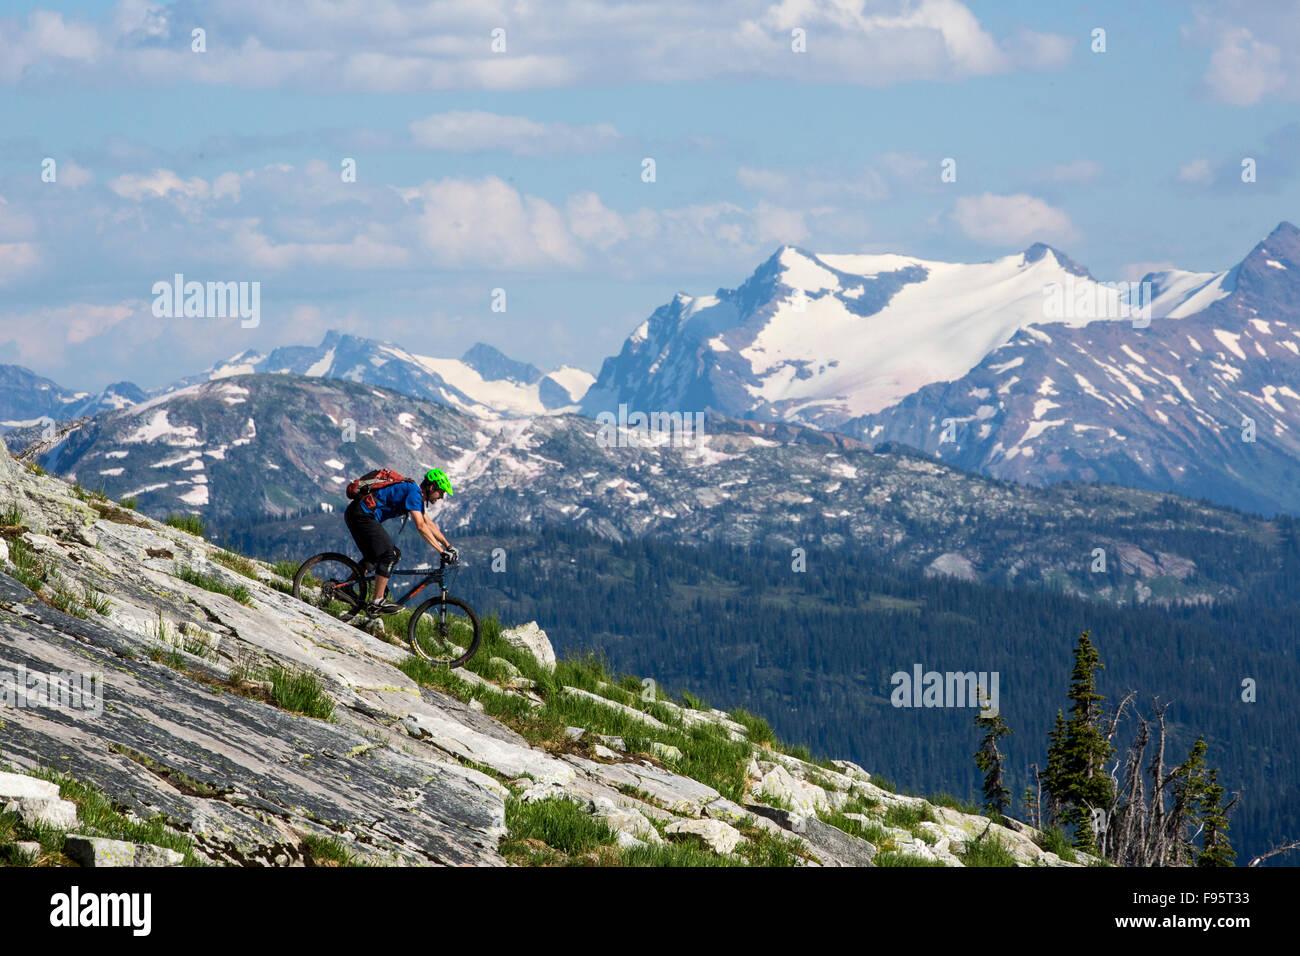 Mountain Biking, Eagle Pass, Mount English, Monashee Mountains, Revelstoke, British Columbia, Canada, alpine mountain - Stock Image